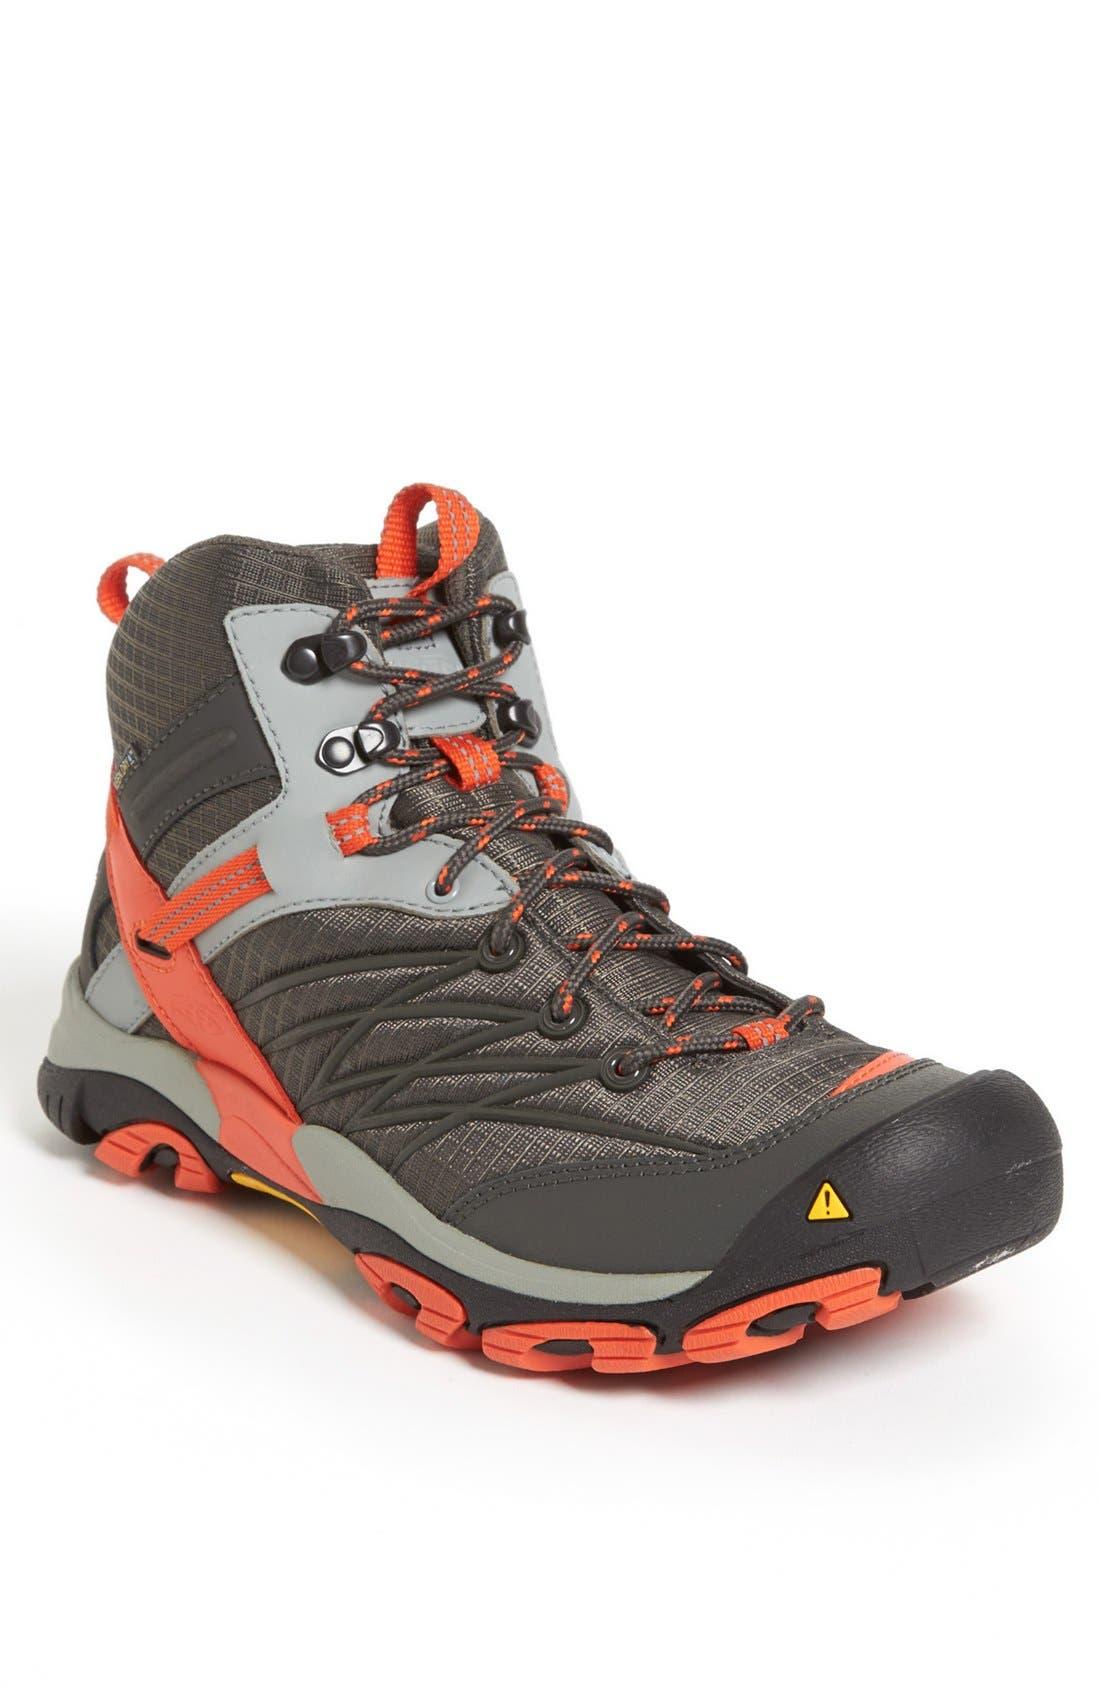 Alternate Image 1 Selected - Keen 'Marshall Mid WP' Hiking Boot (Men)